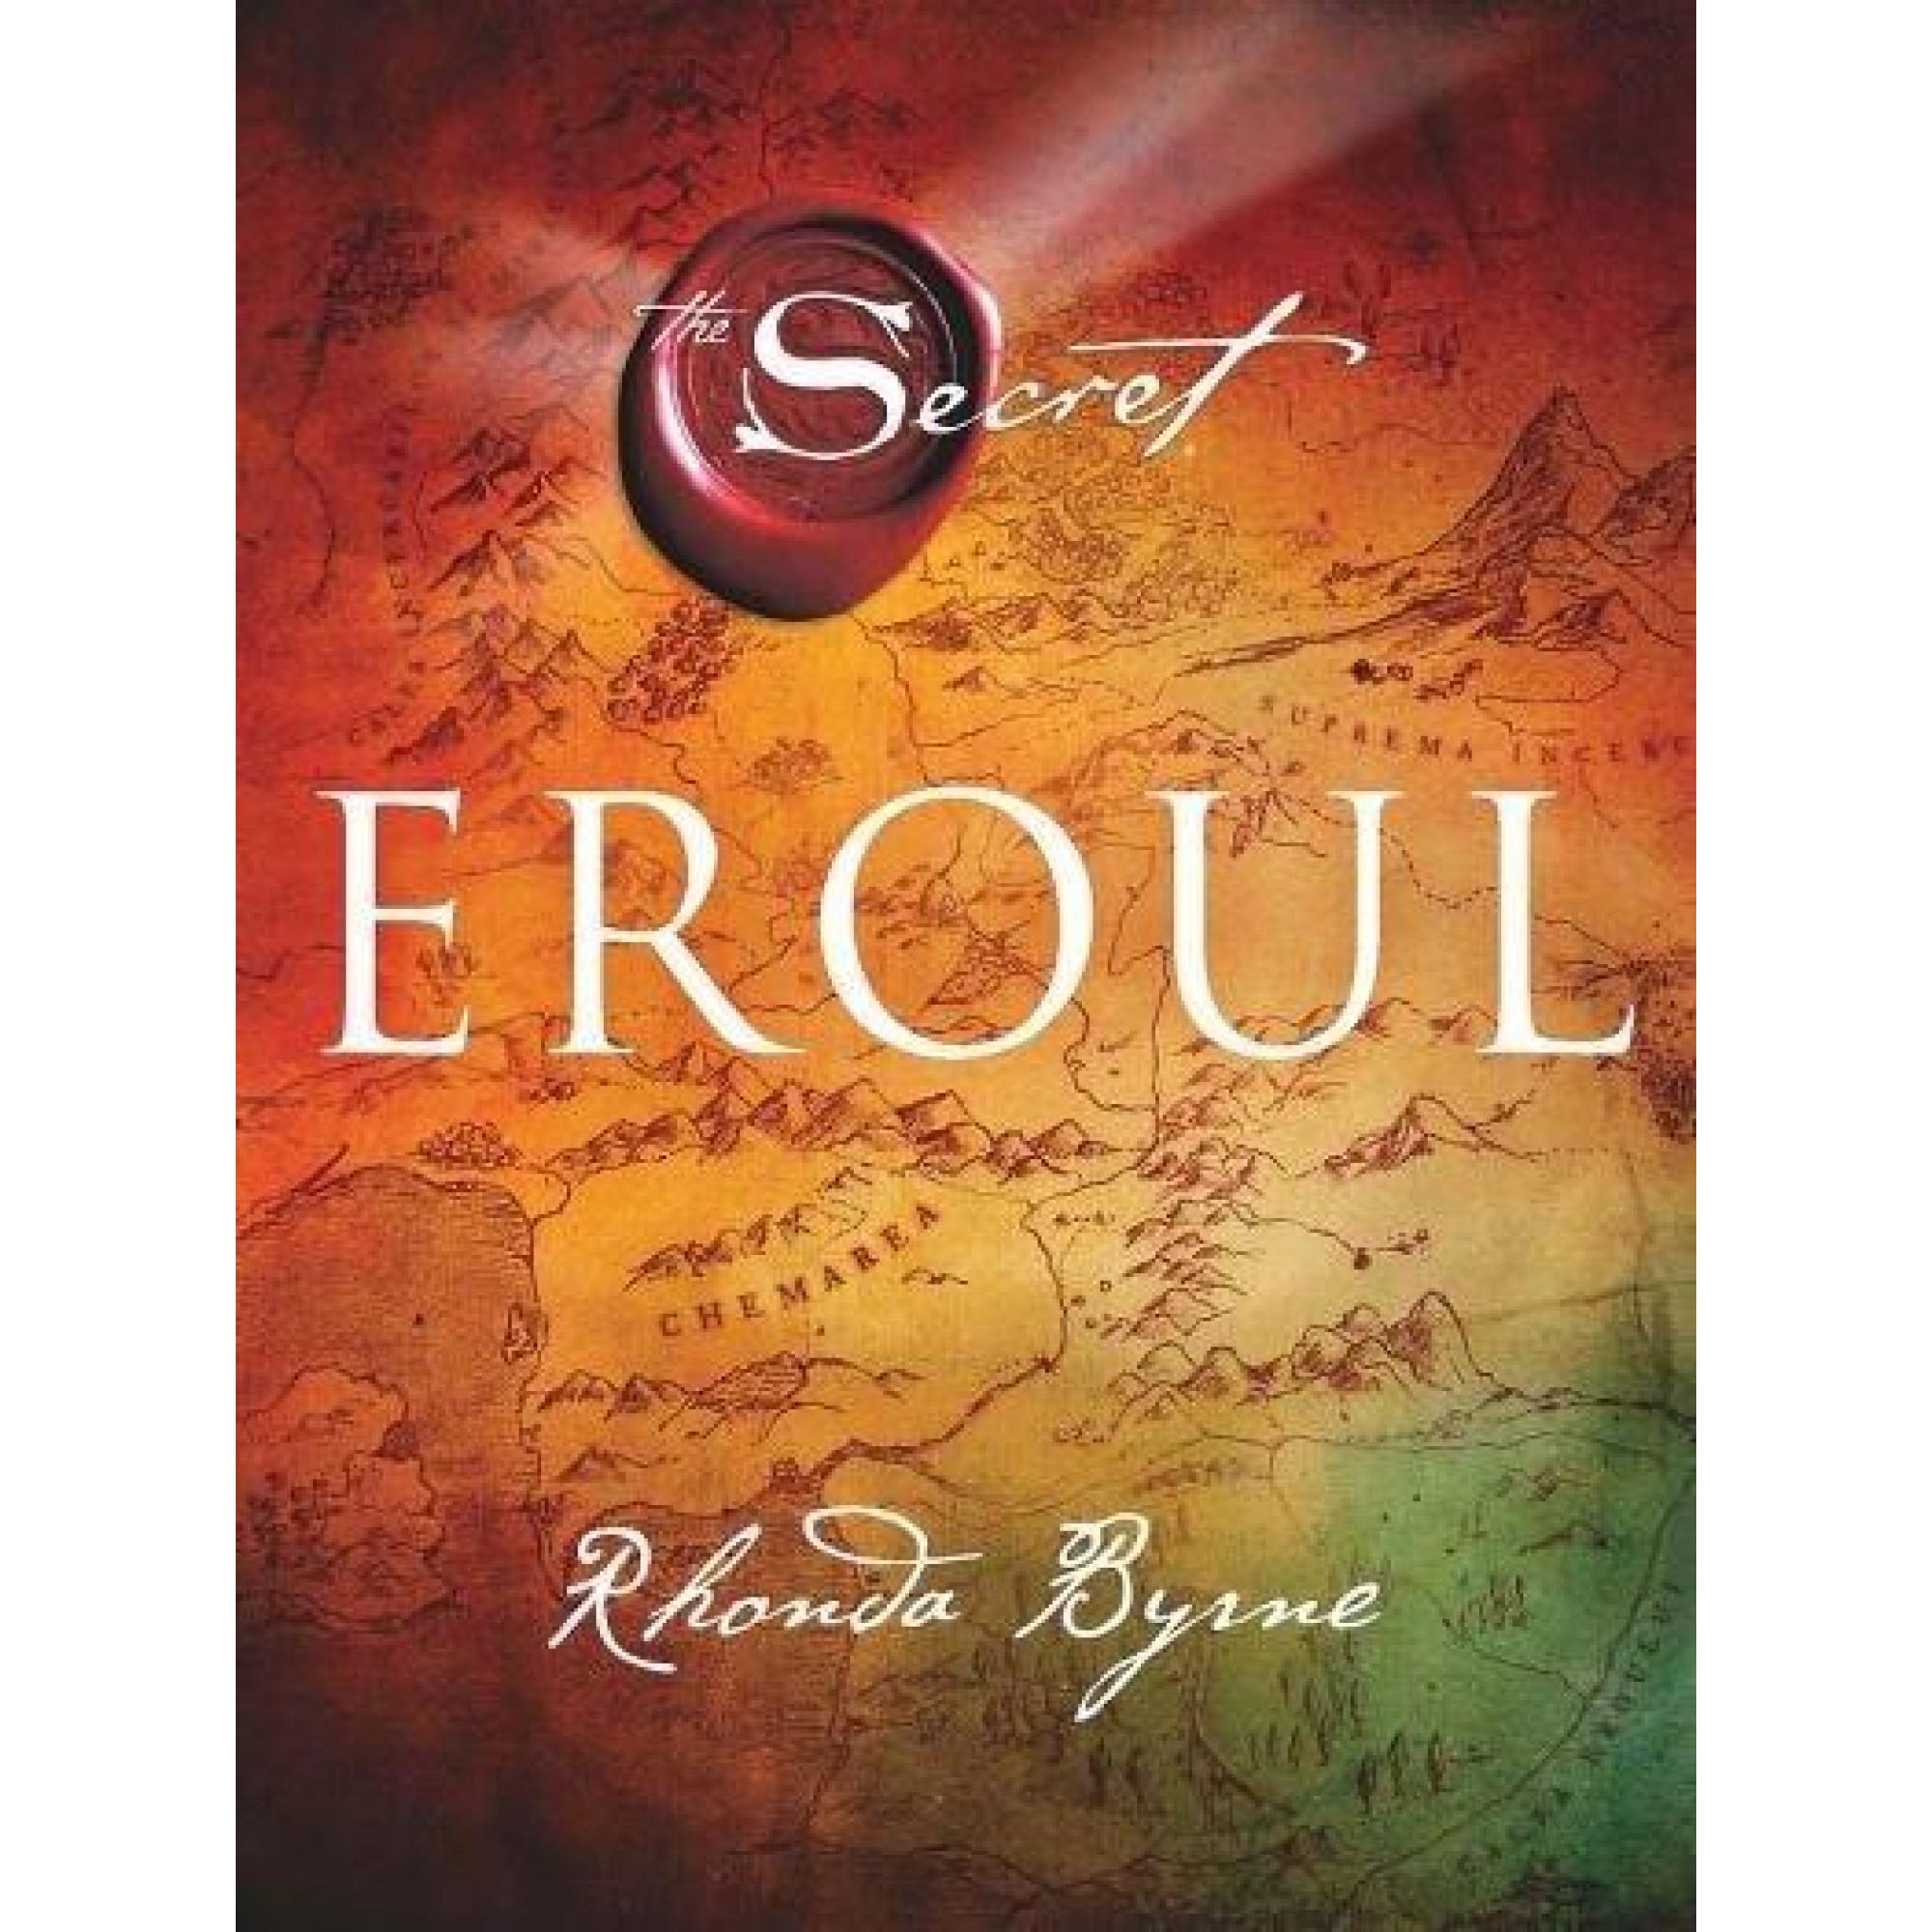 Eroul (Secretul): Cartea 4; Rhonda Byrne